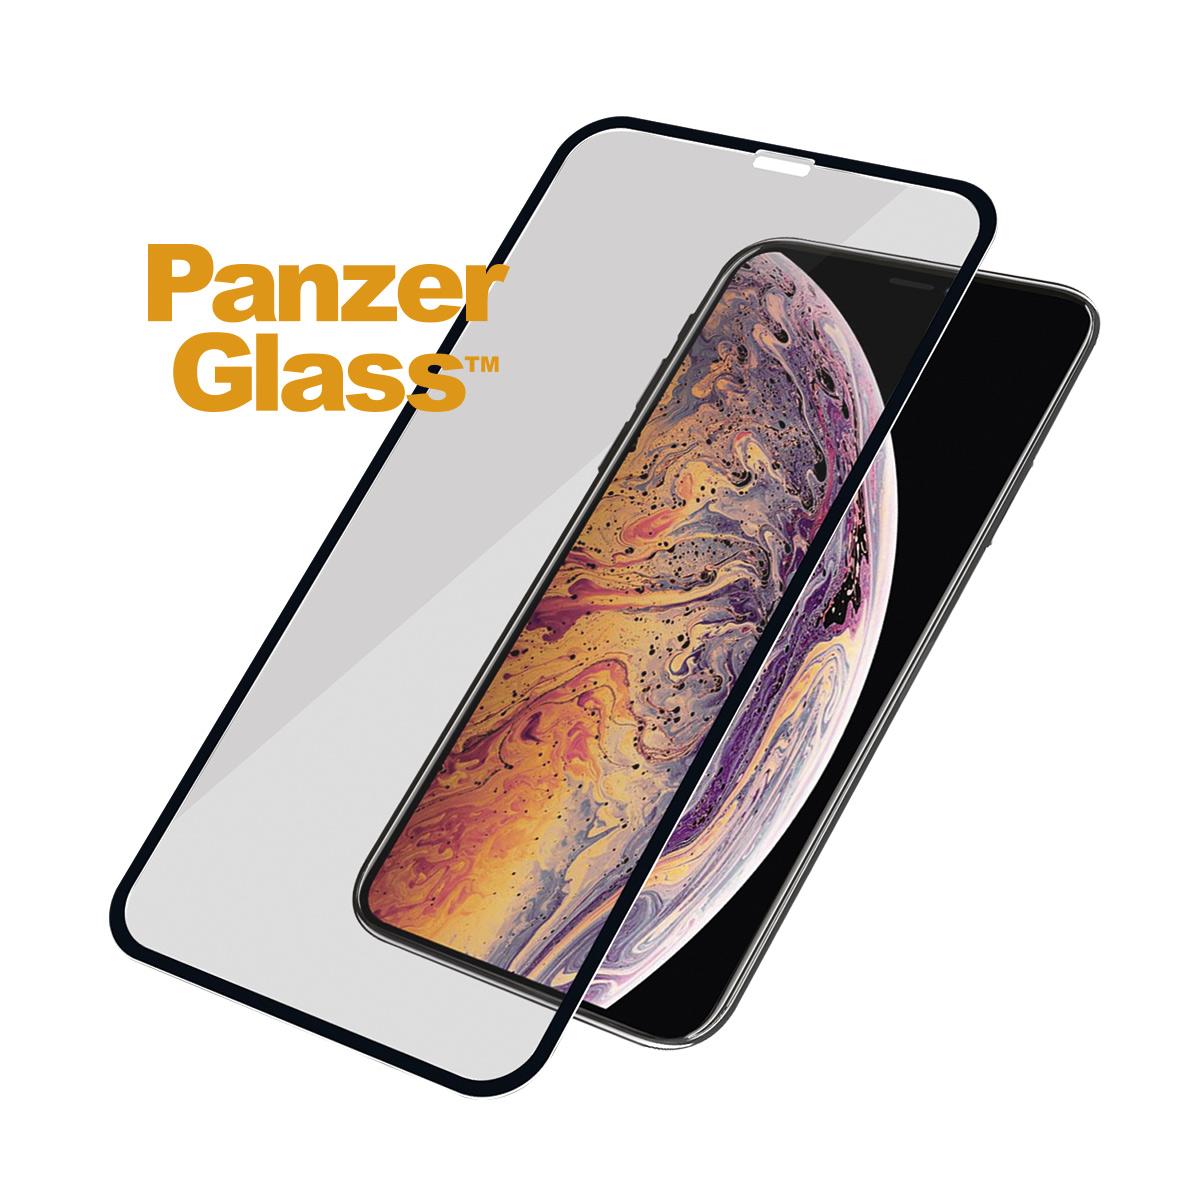 PanzerGlass iPhone Xs